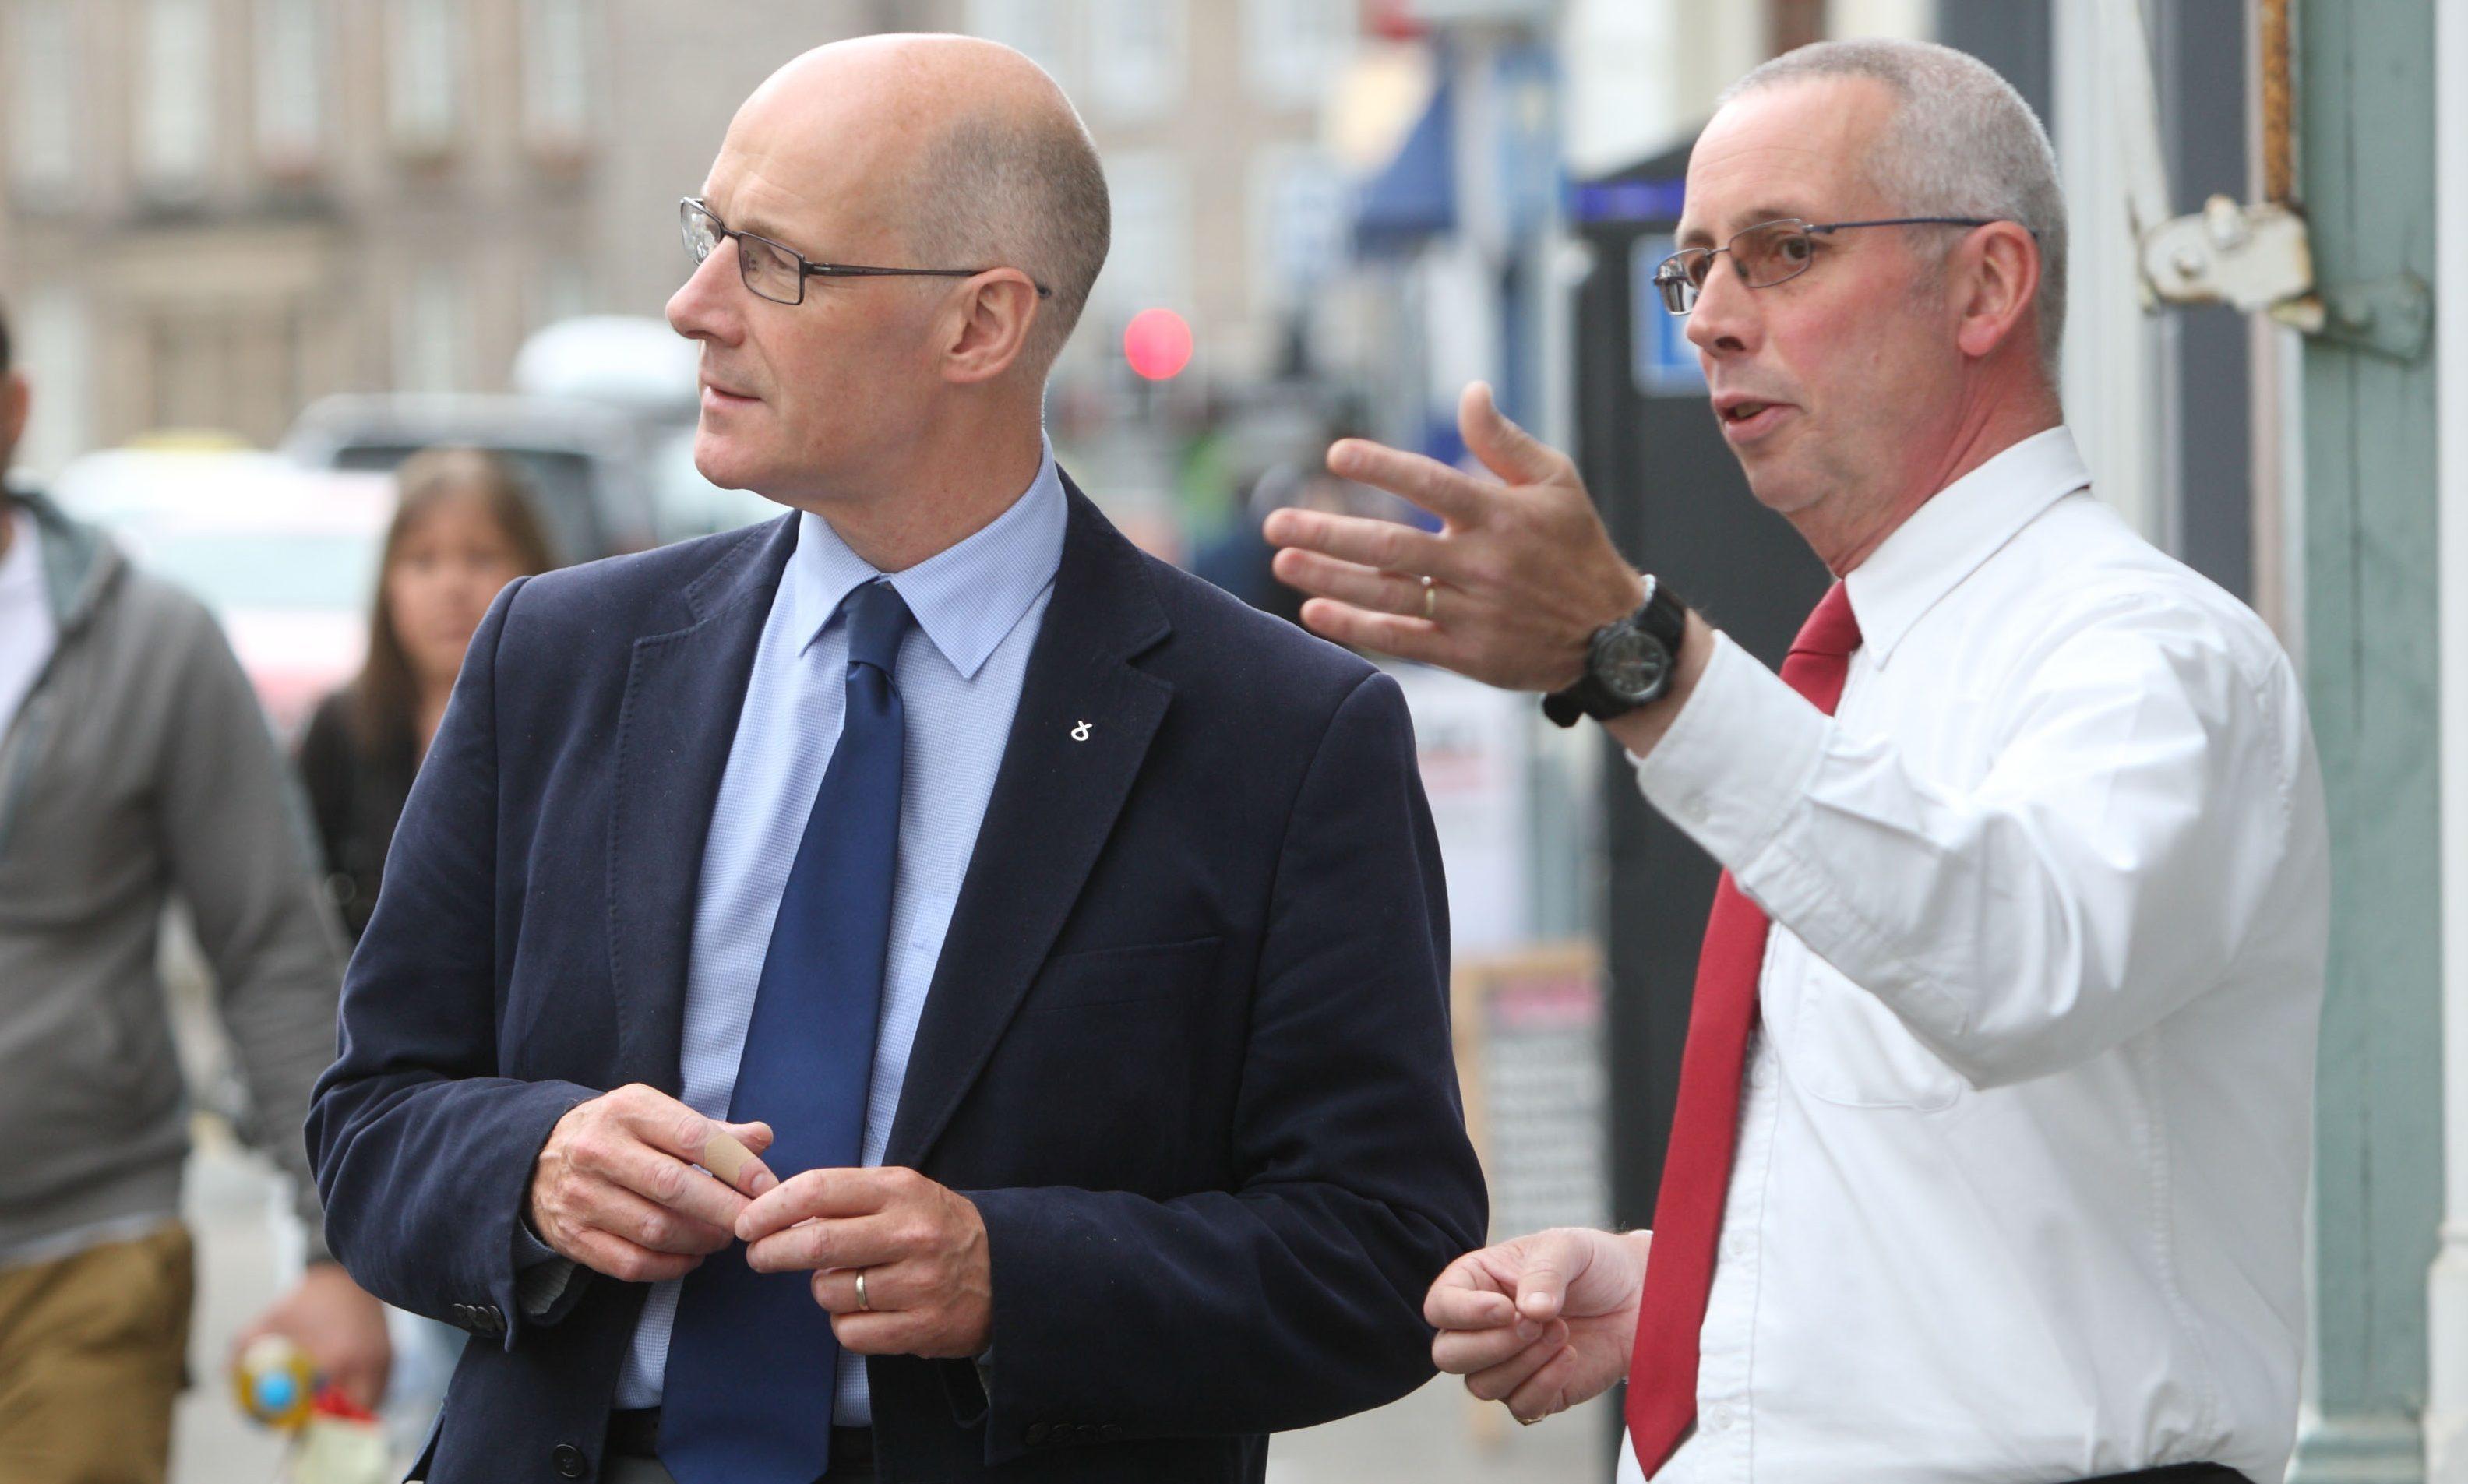 Deputy First Minister John swinney MSP, left, with Keith Fergie in Perth.